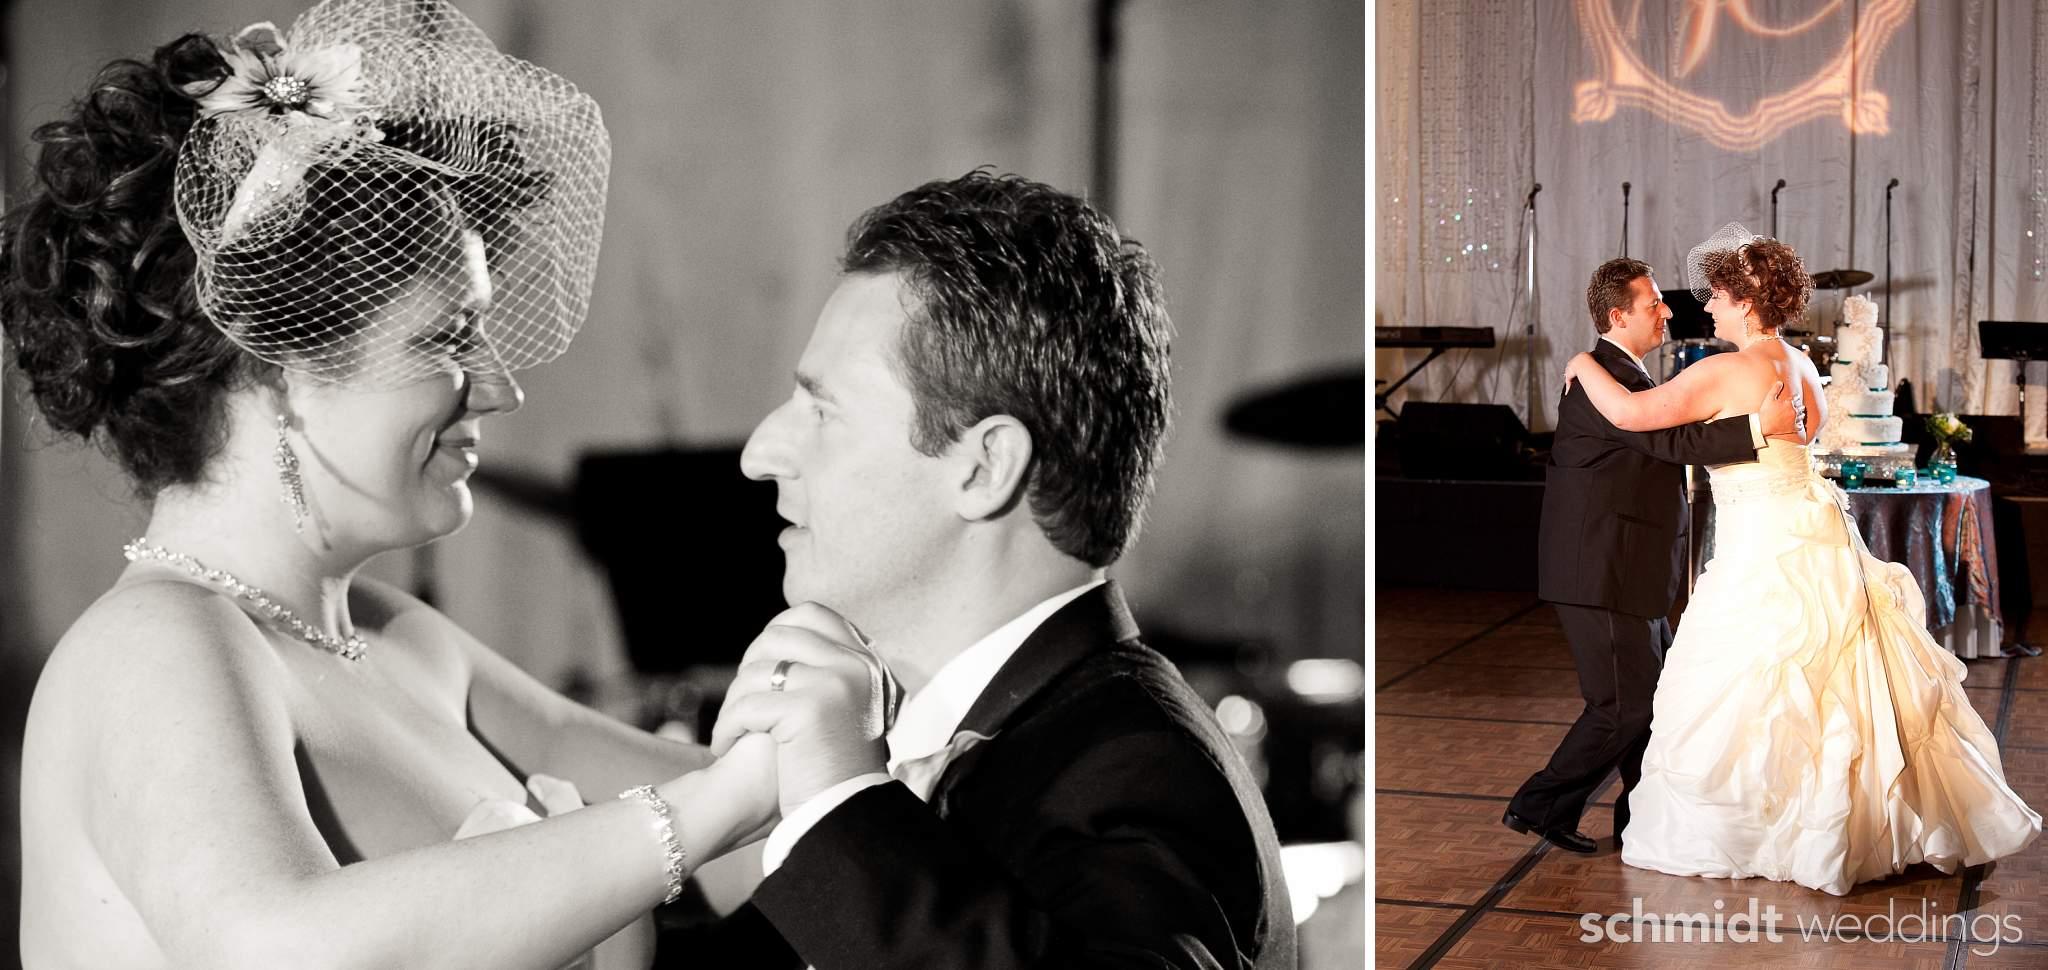 First Dance wedding reception with fun innovative decorating ideas artistic photos tom schmidt